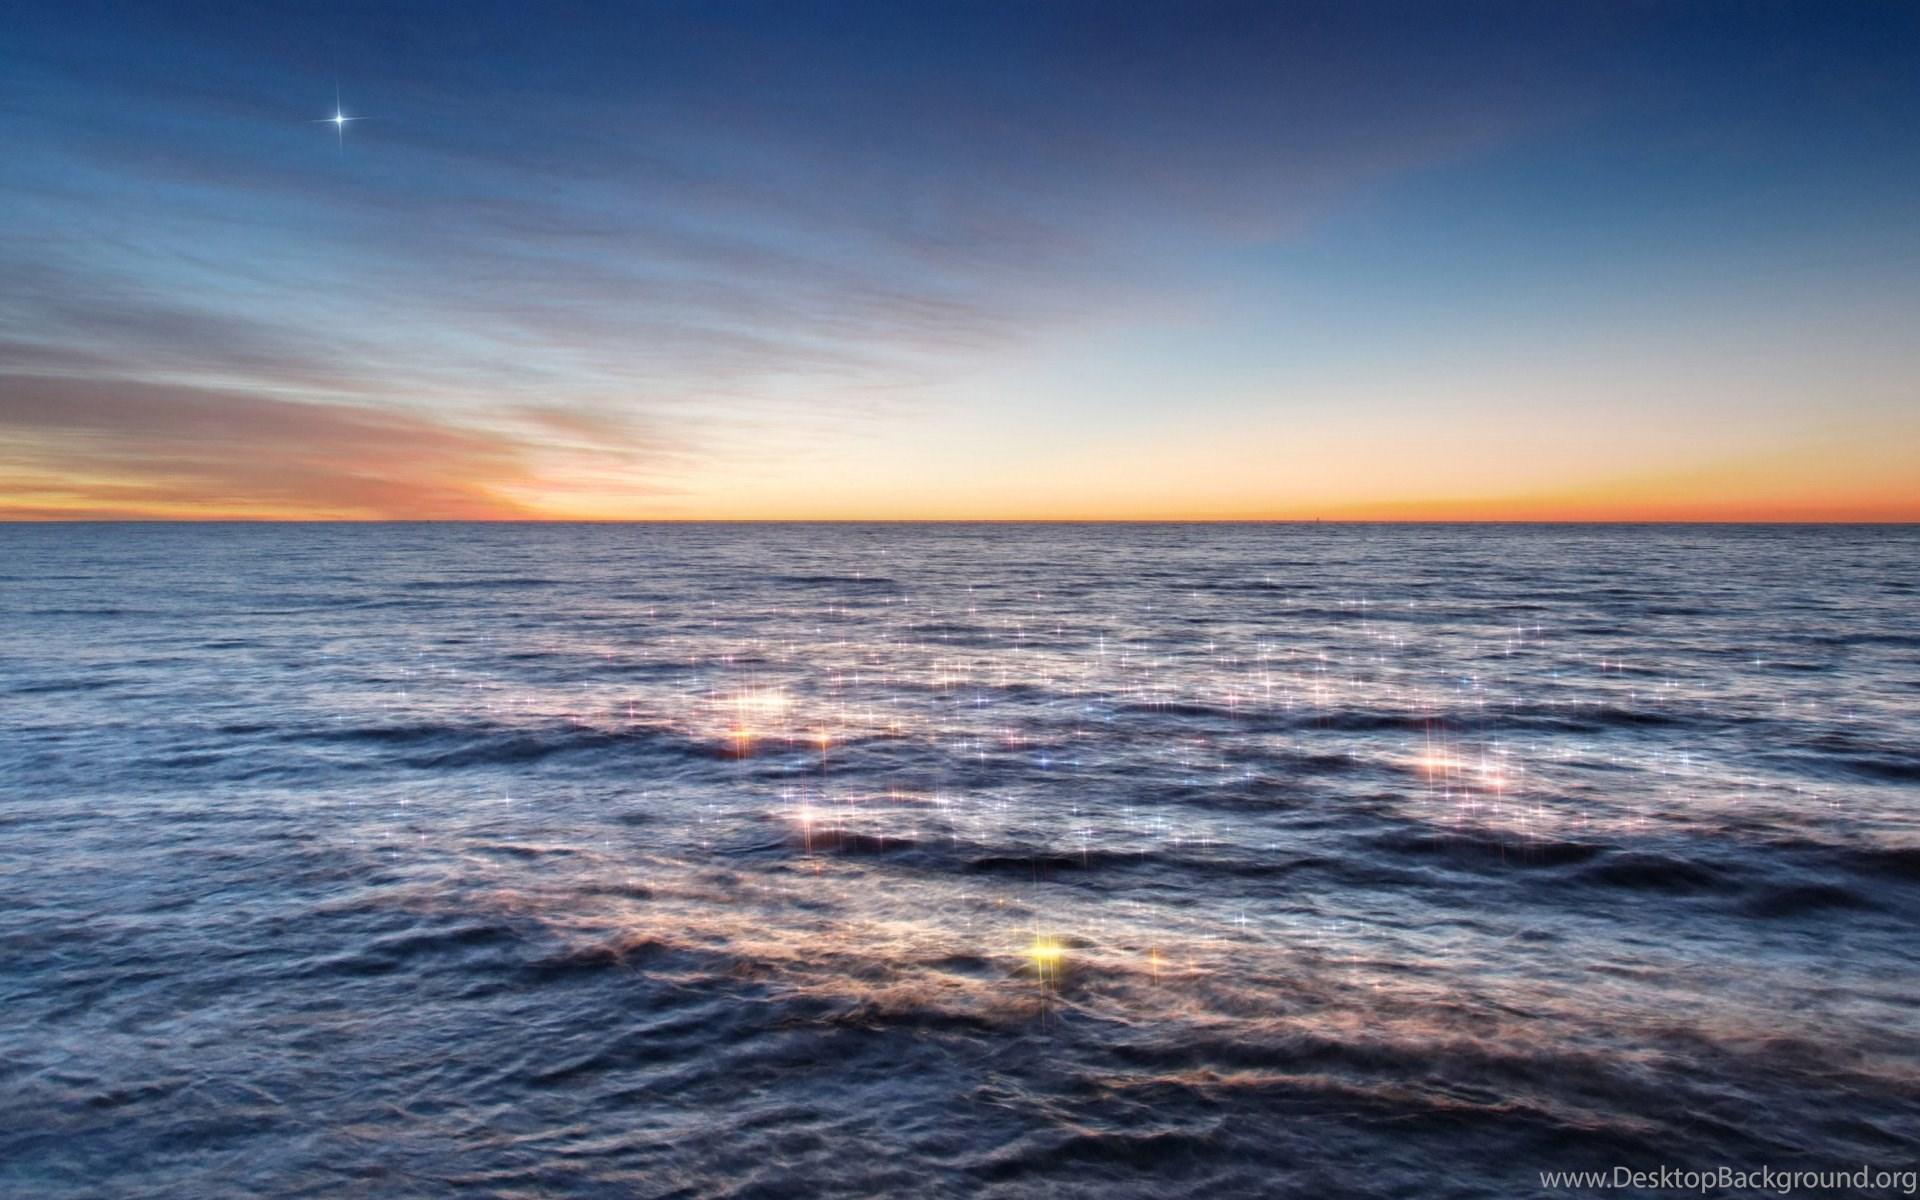 Evening In Malibu IPhone Panoramic Wallpapers Download Desktop Background